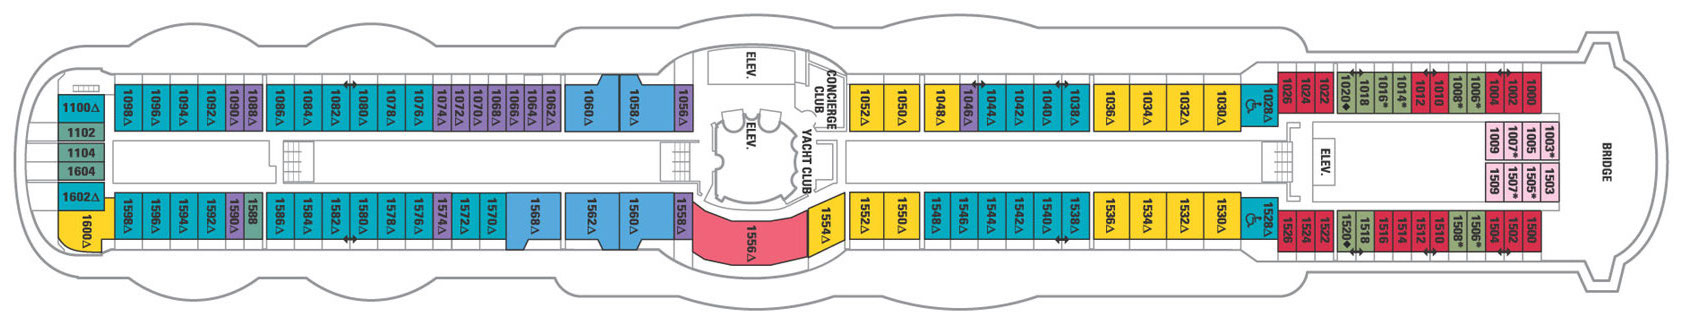 Royal Caribbean- Jewel of the Seas Deck  10.jpg